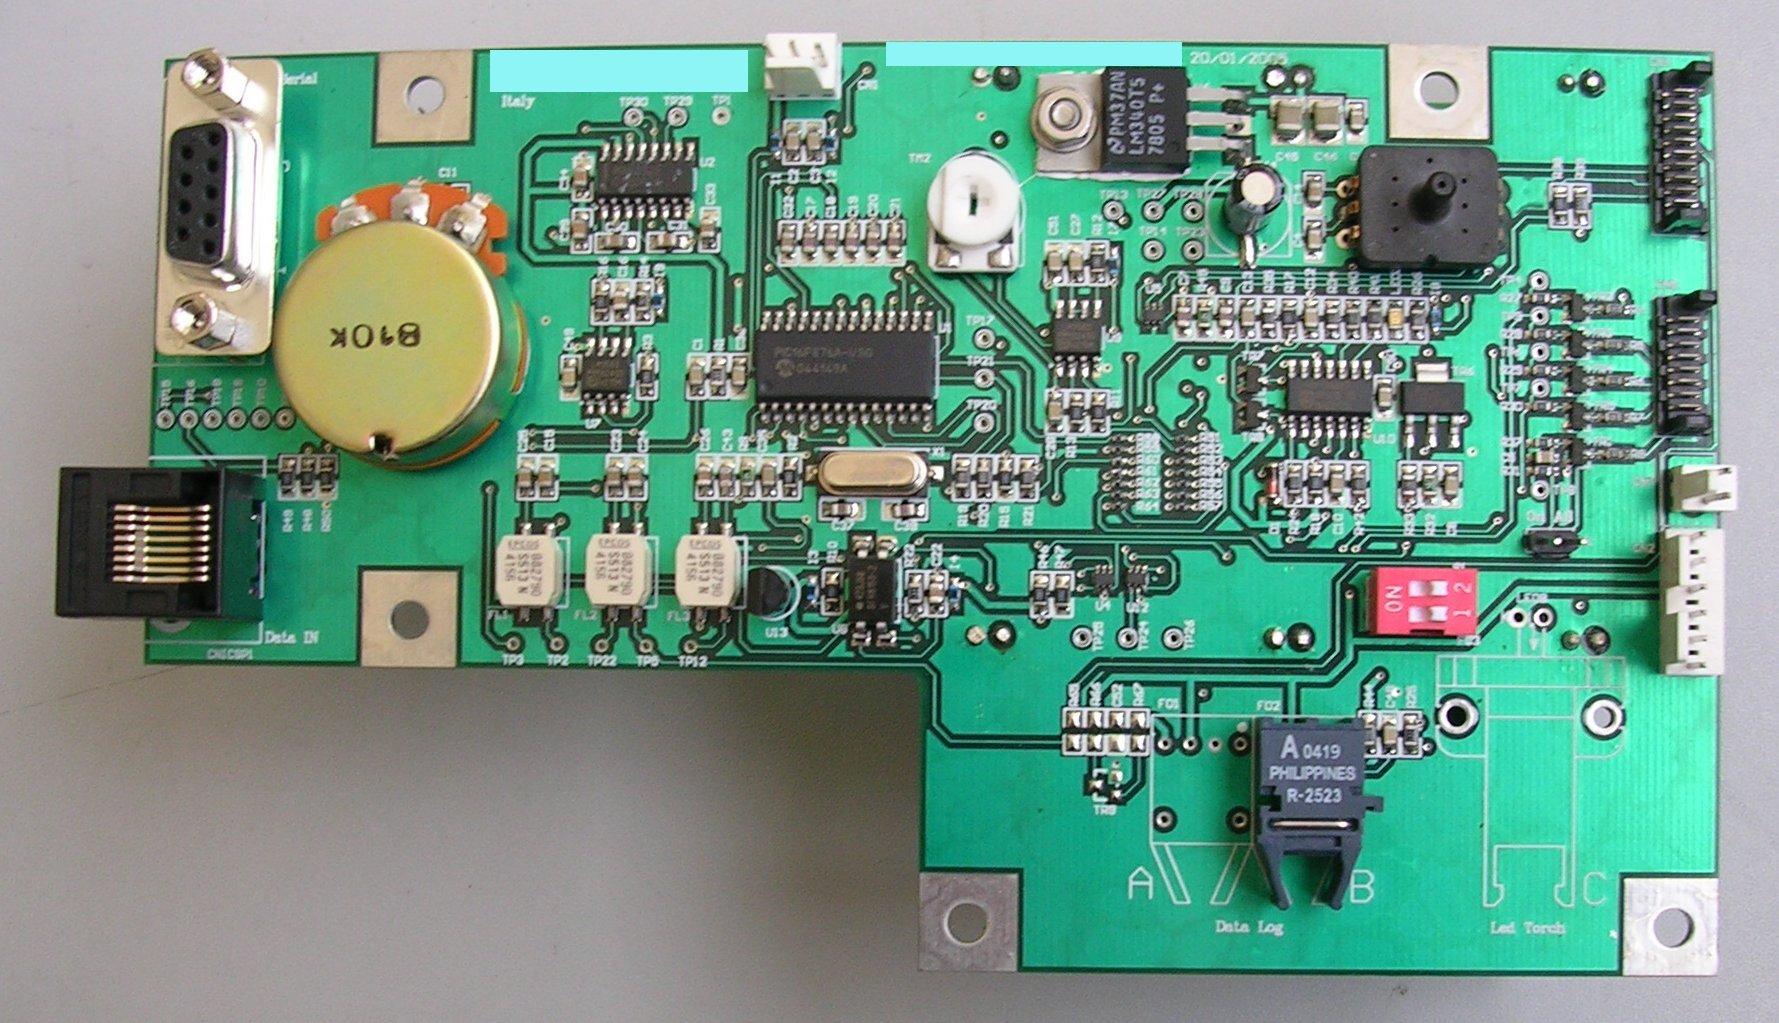 Hardware industriale